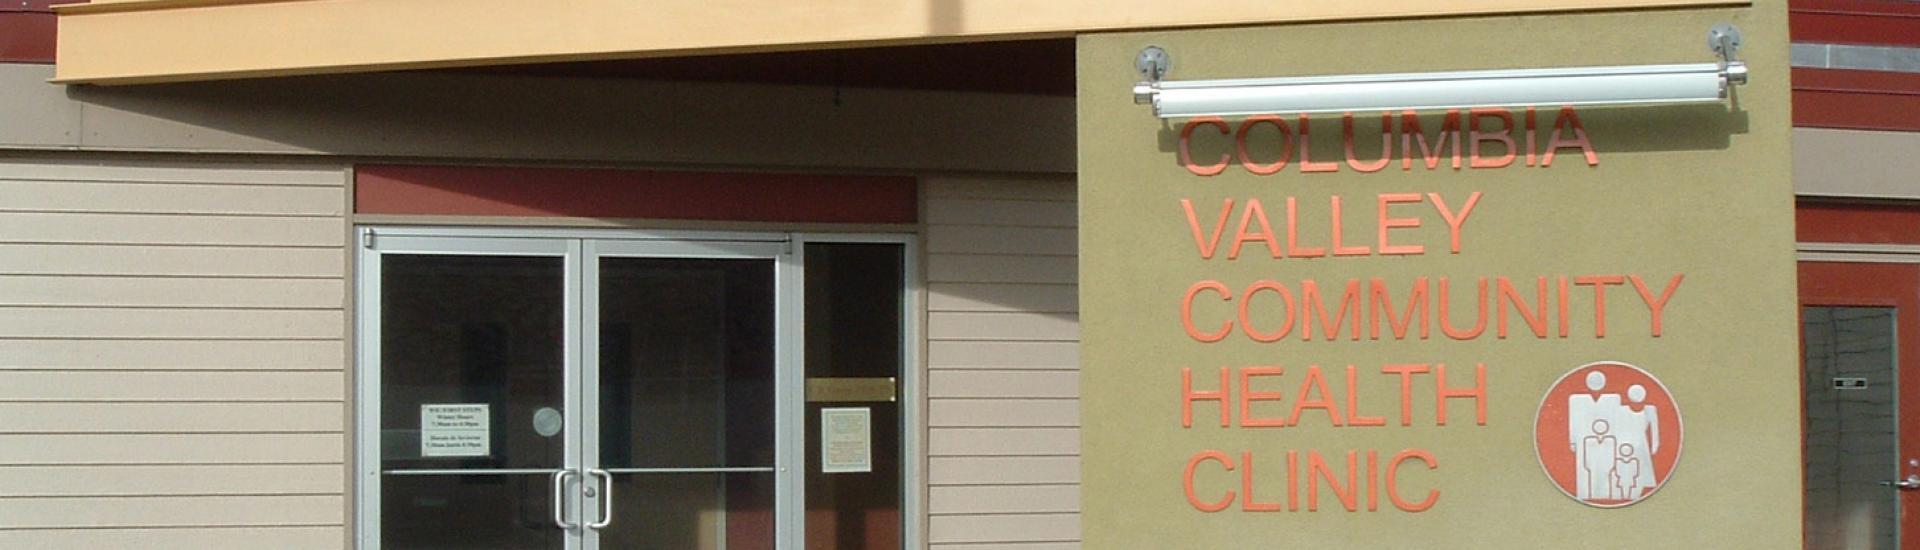 Columbia Valley Community Health - Chelan